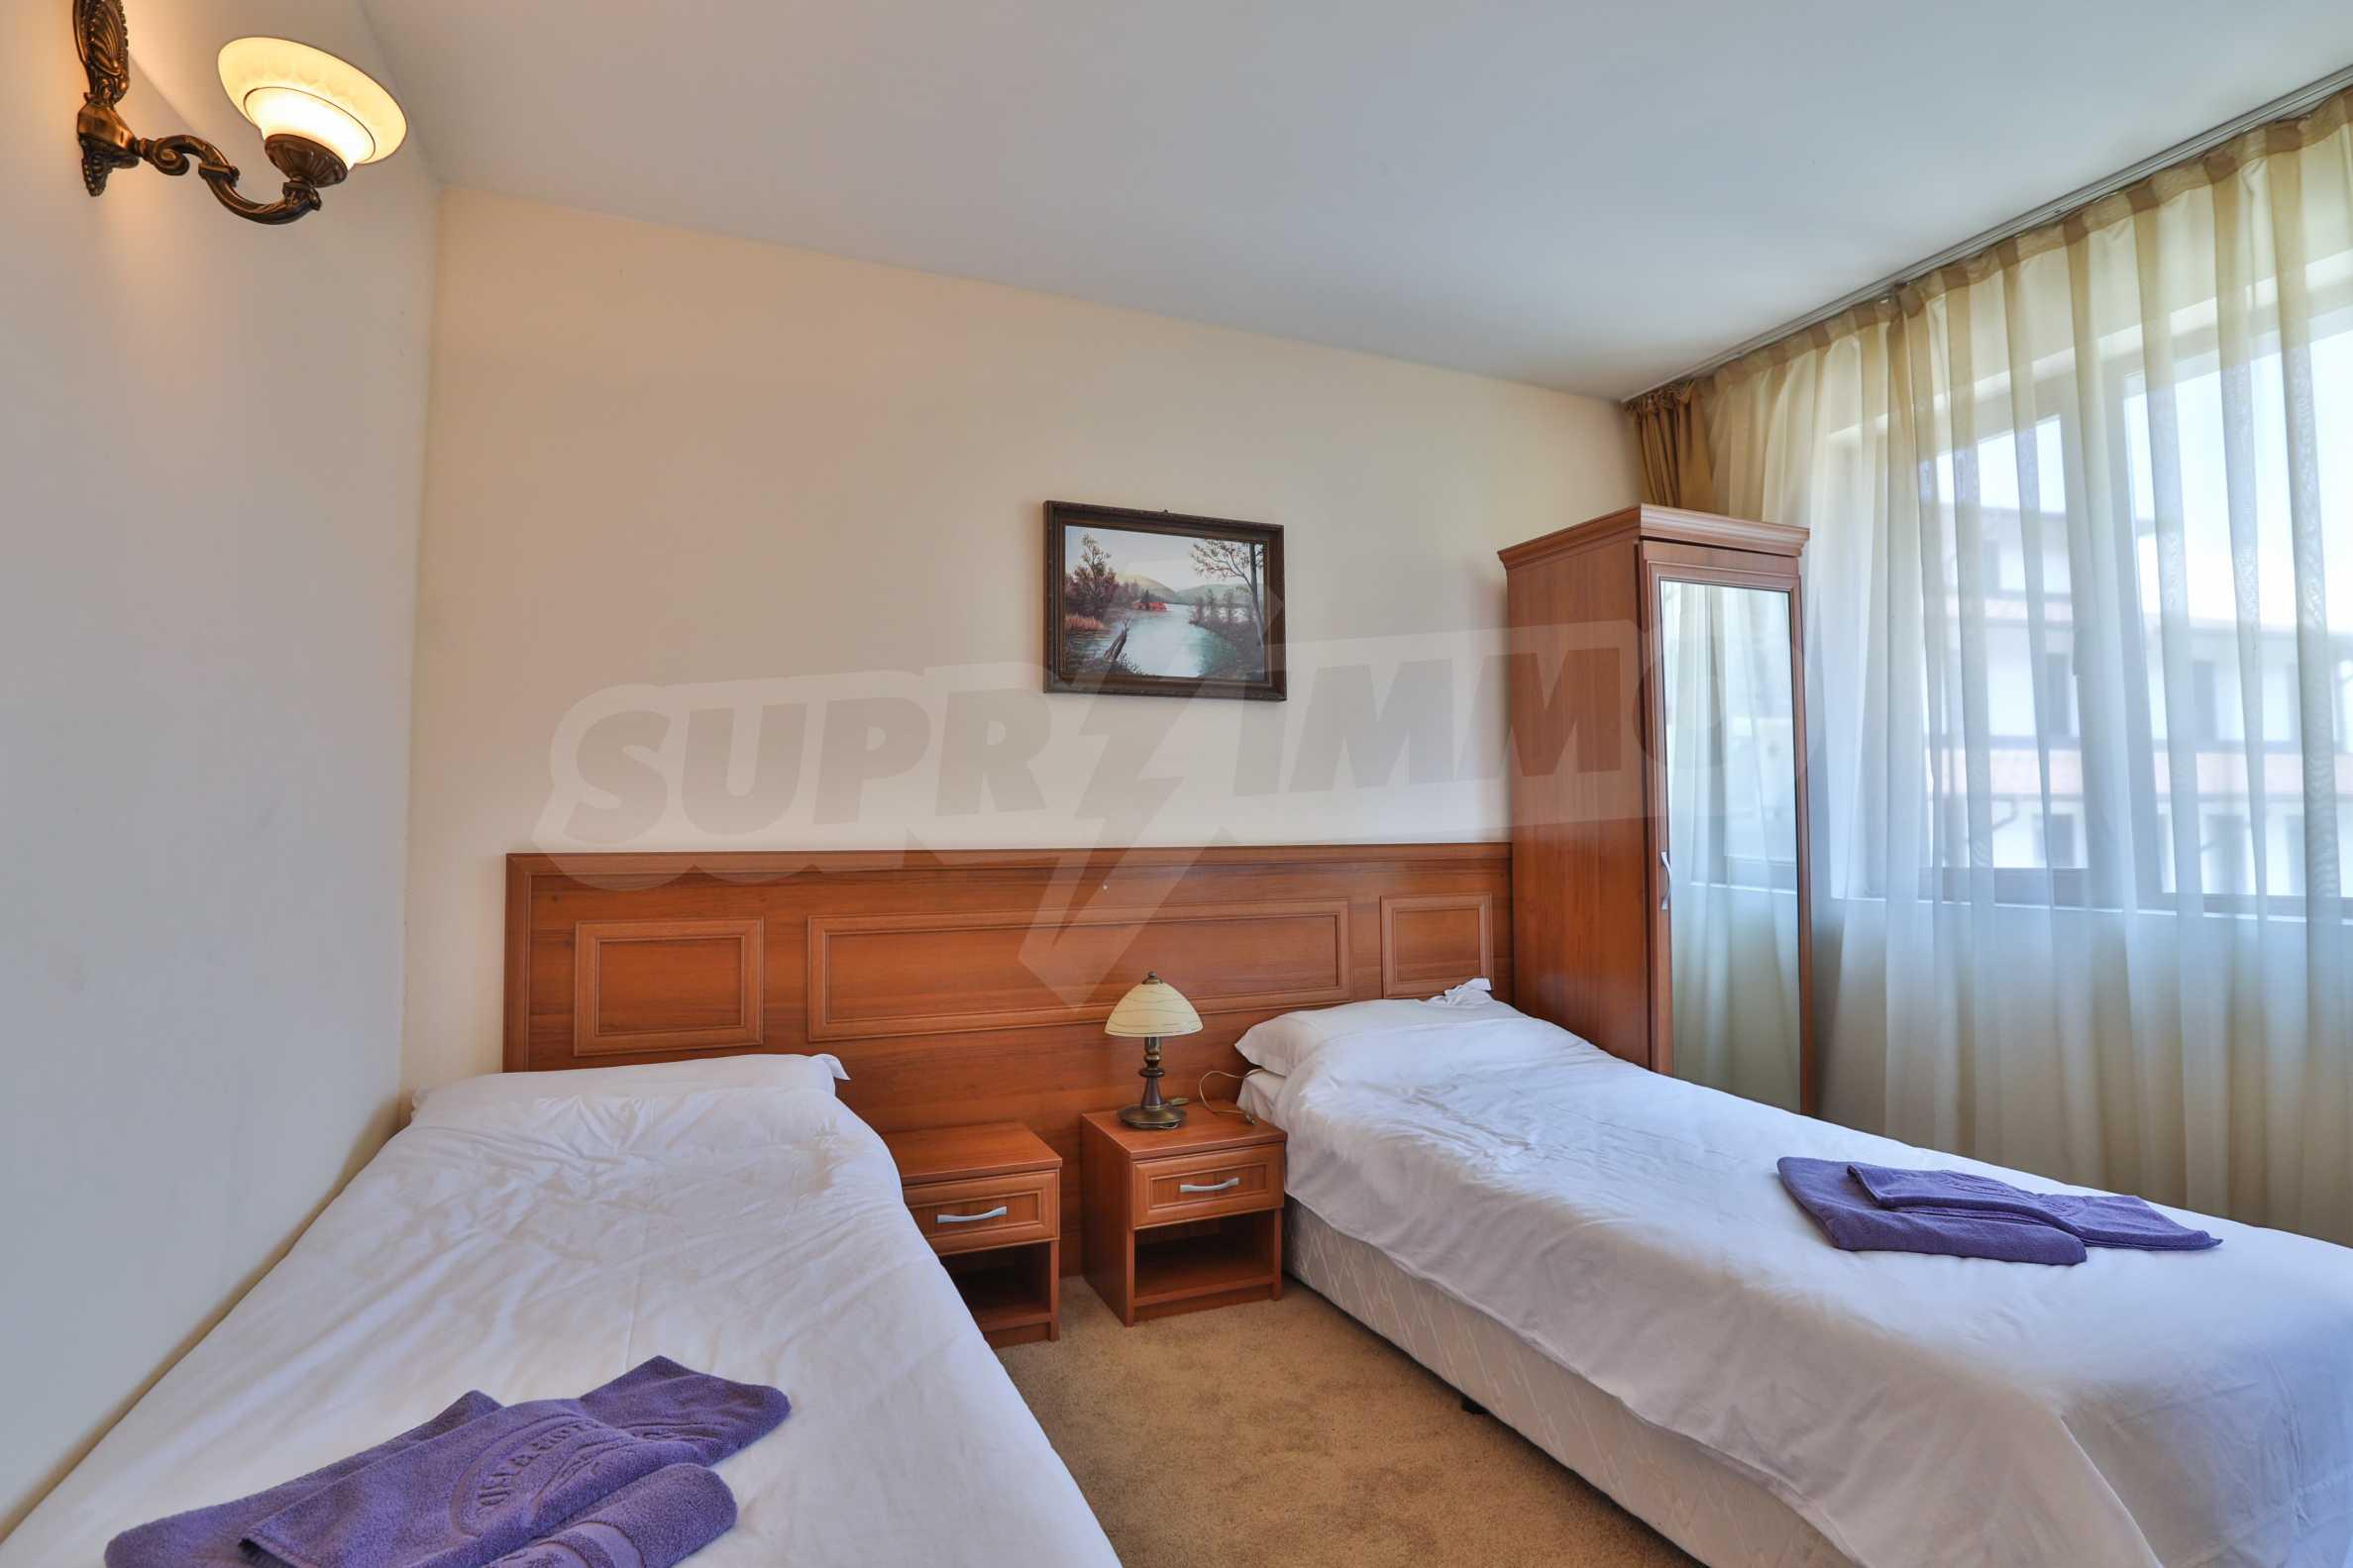 Просторен тристаен апартамент, намиращ се в комплекс Емералд в Банско 5